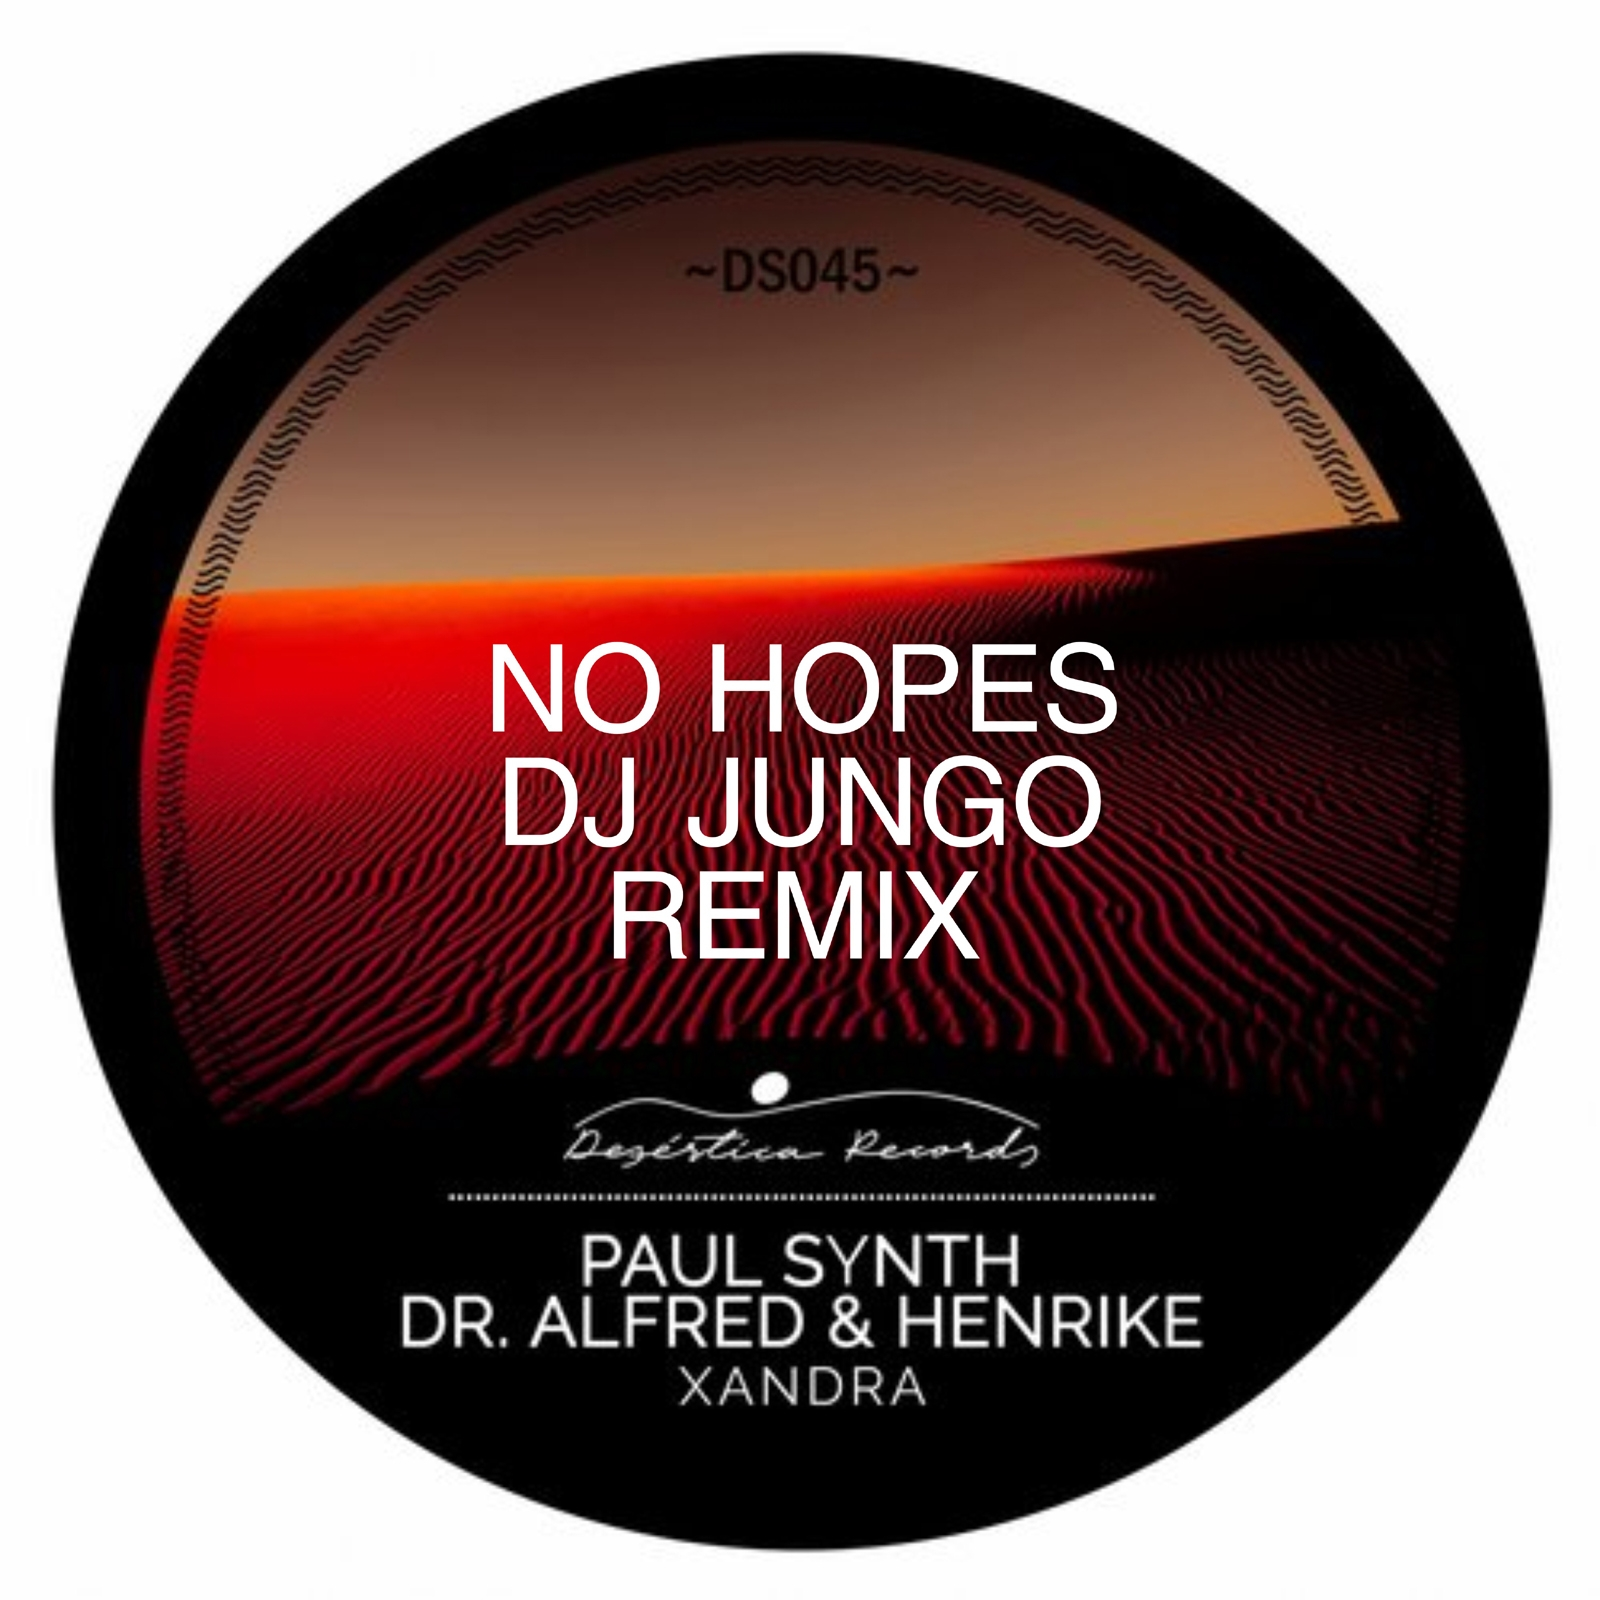 Dr. Alfred, Henrike, Paul Synth - Xandra (DJ JunGo, No Hopes Remix)